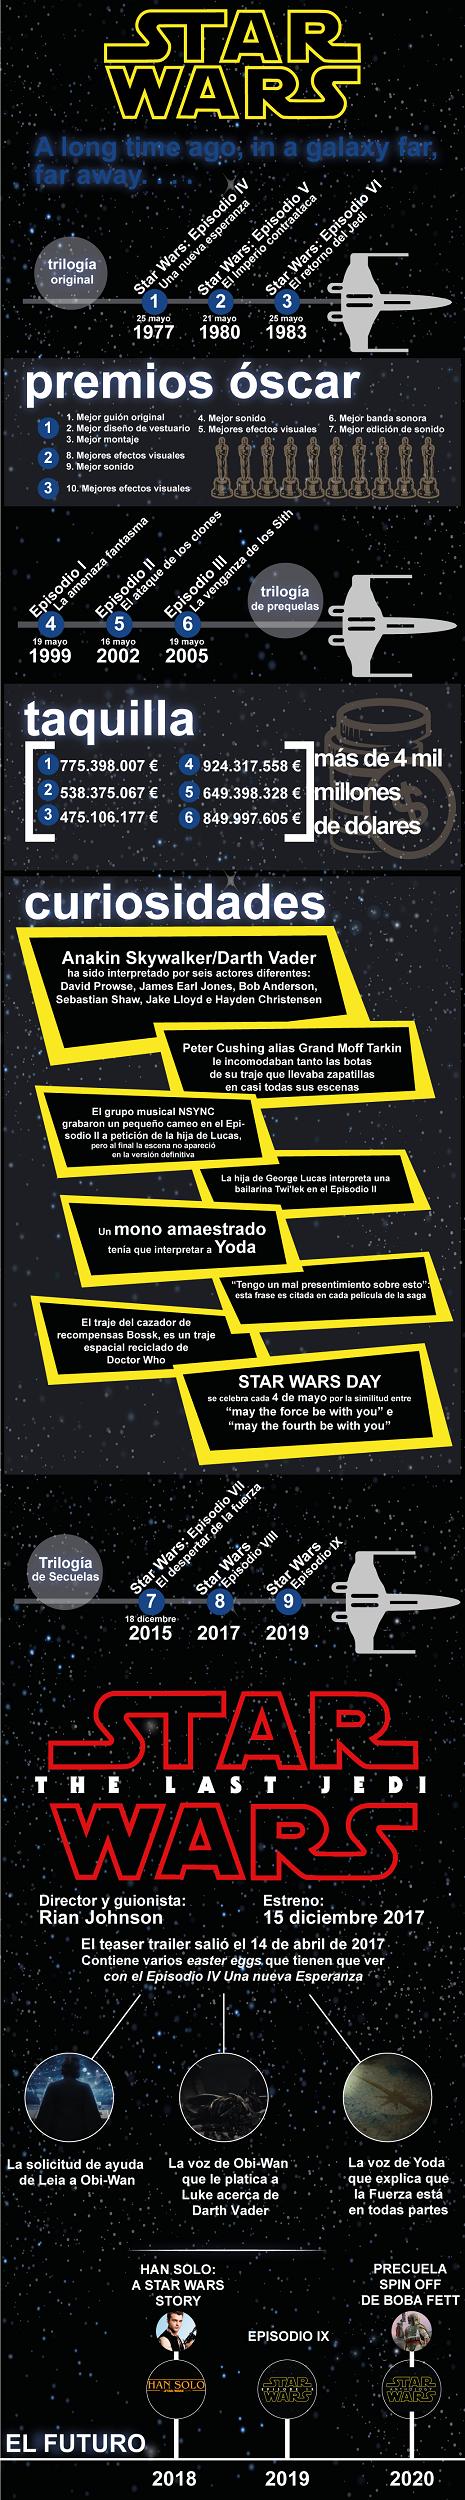 curiosidades star wars